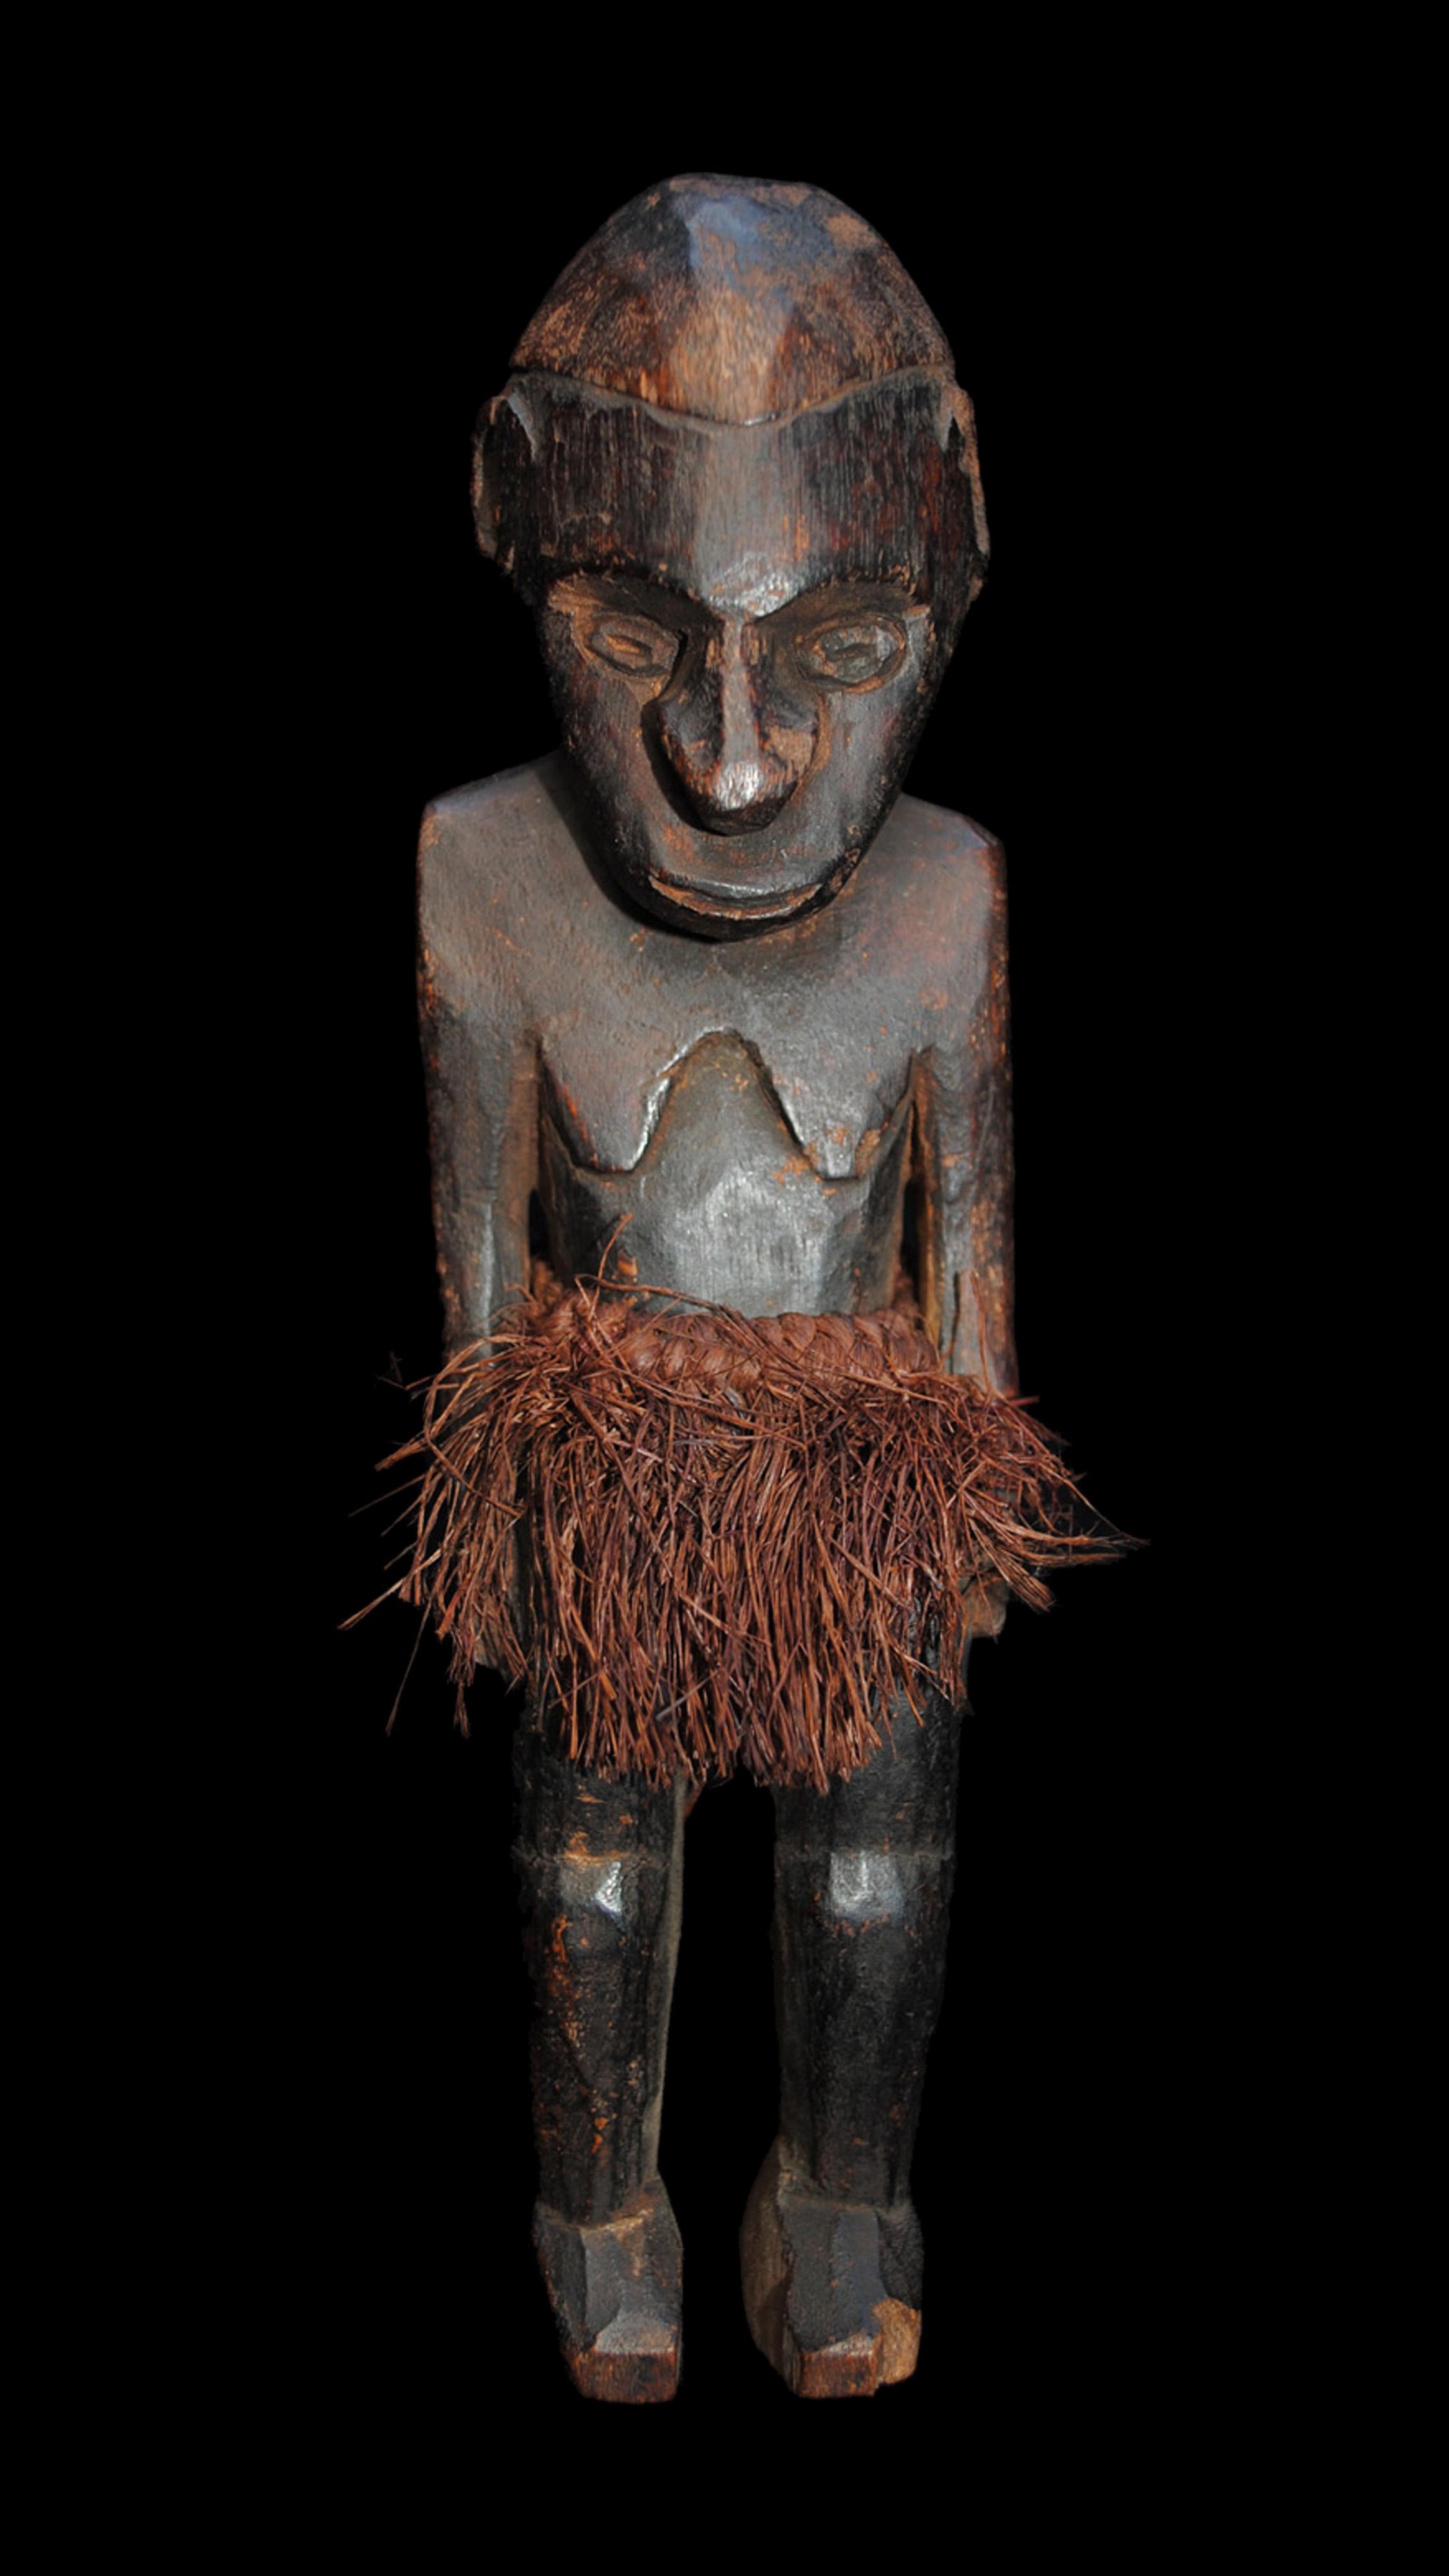 Amulet Figure, Murik Lakes East Sepik Province Papua New Guinea